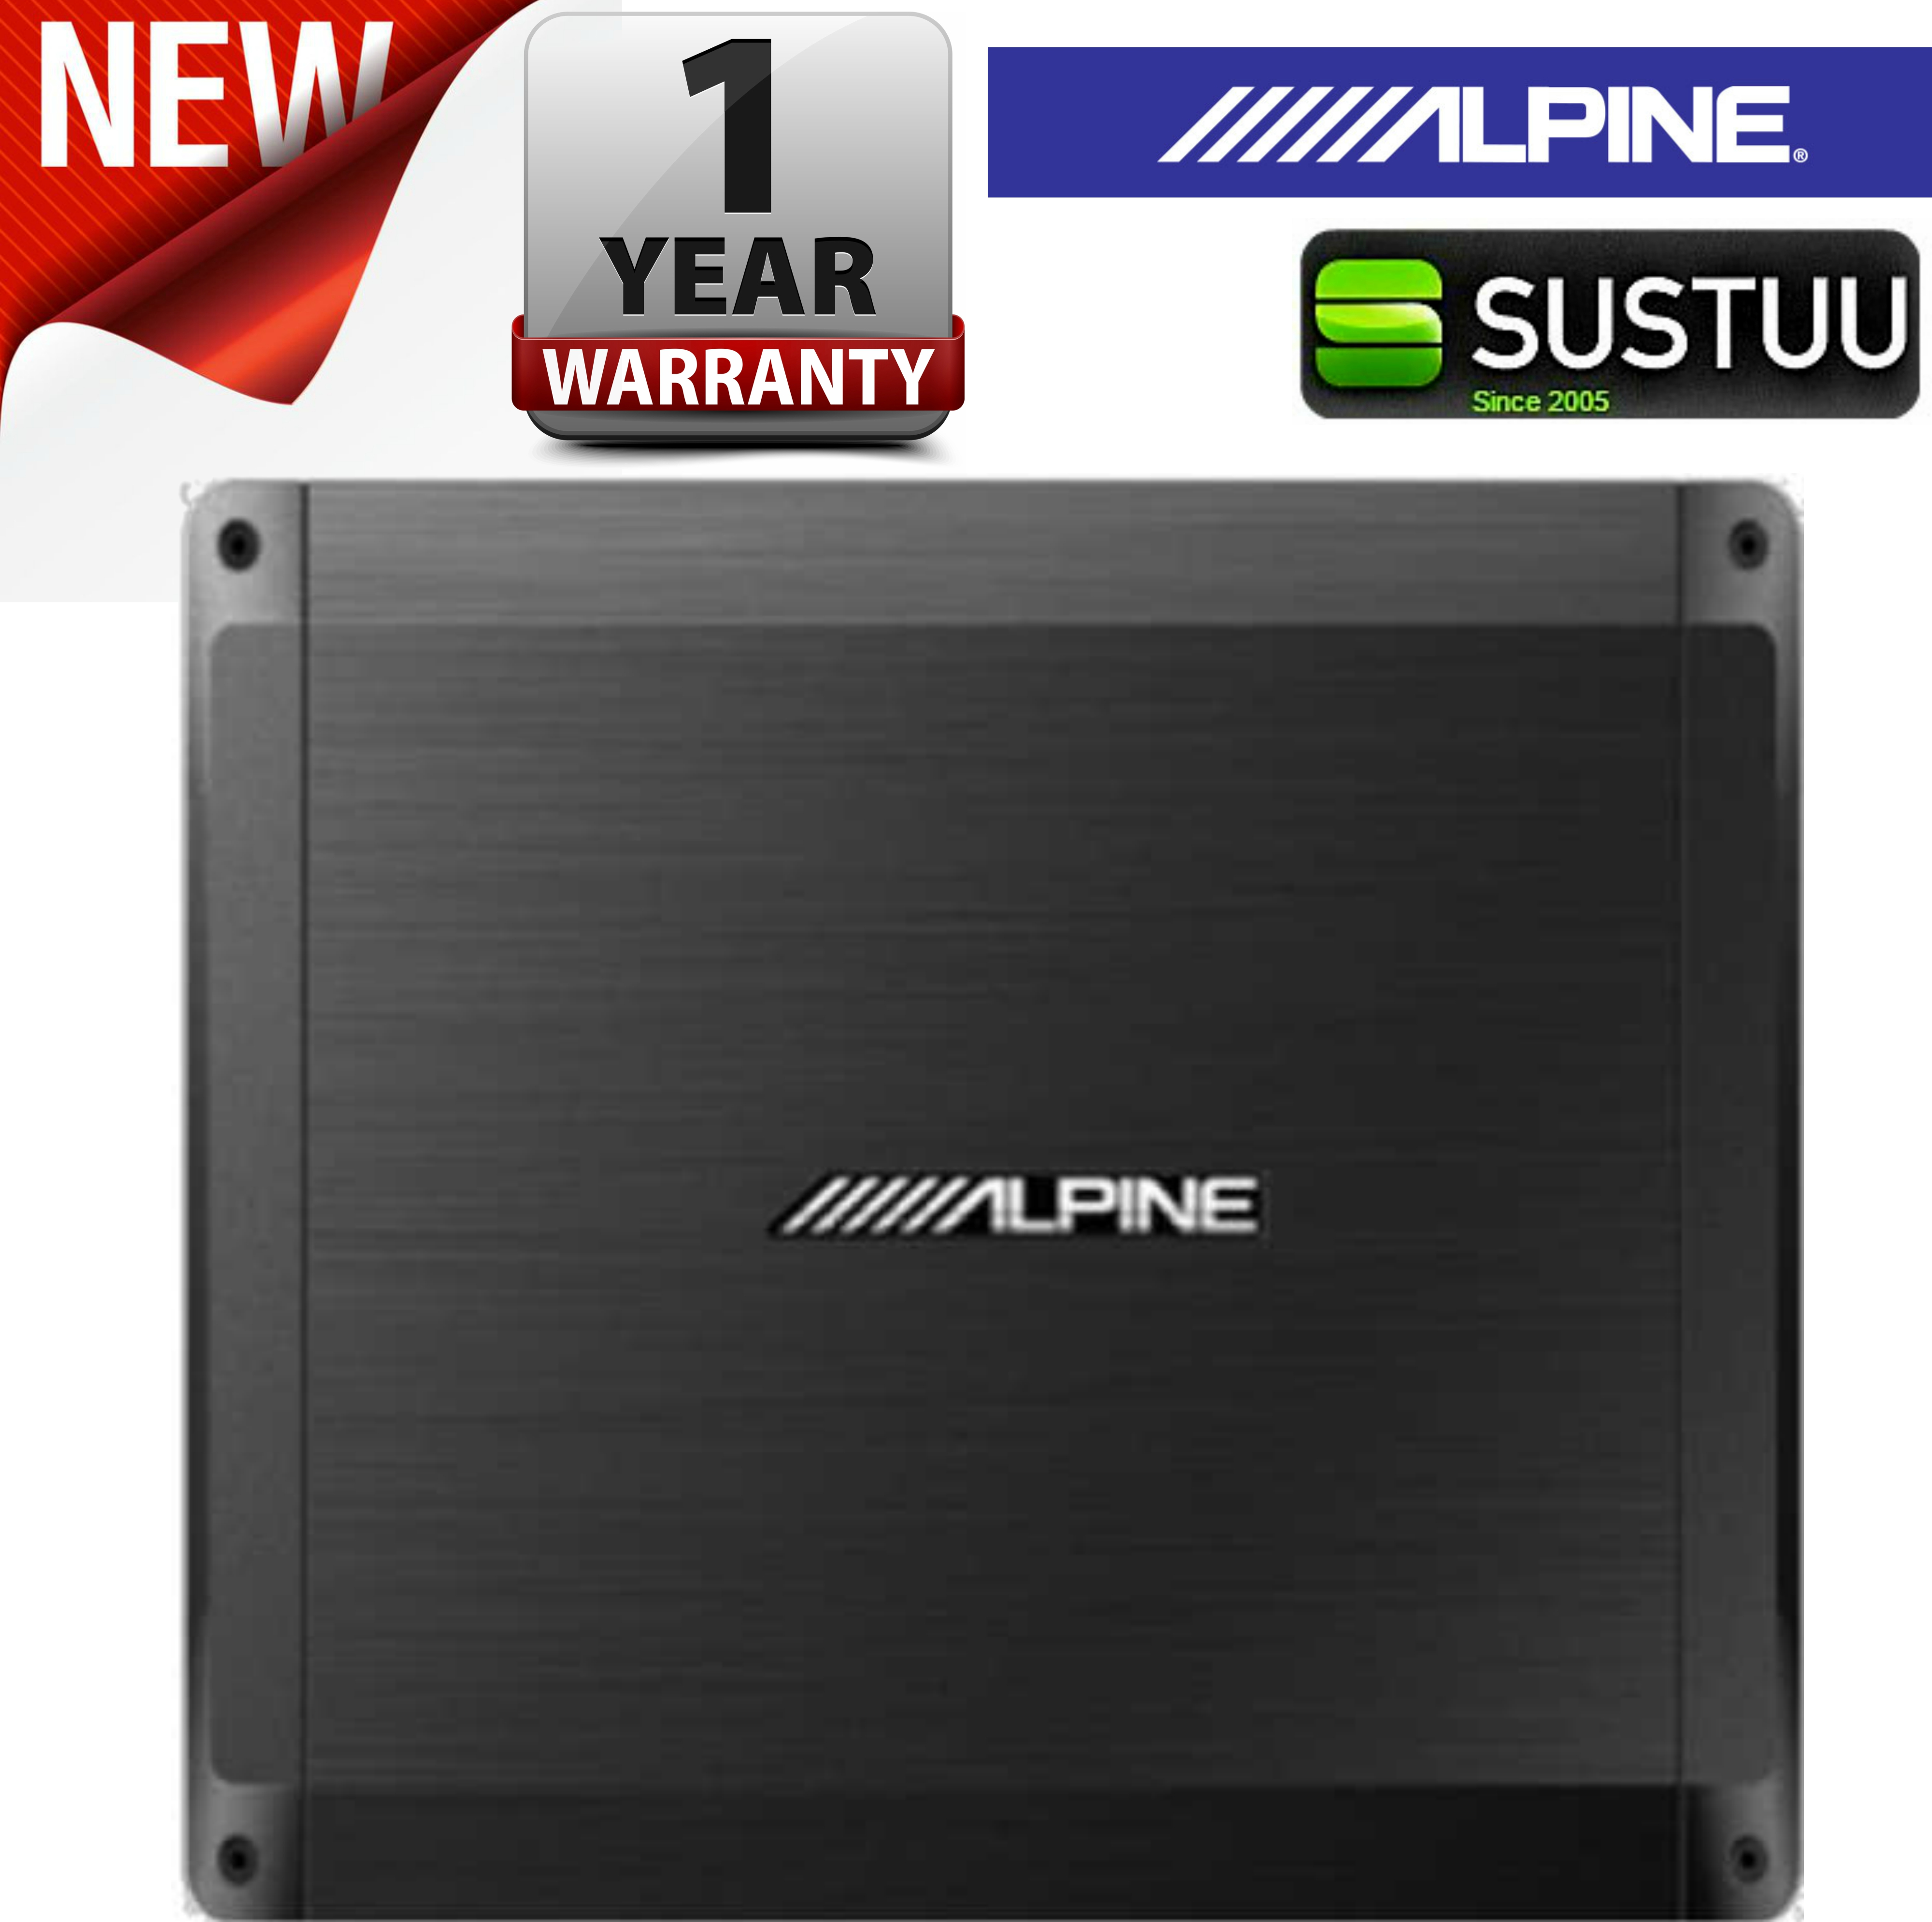 Alpine BBX T600 Power Class A/B Amp 2 Channel Car Sound Audio Amplifier System